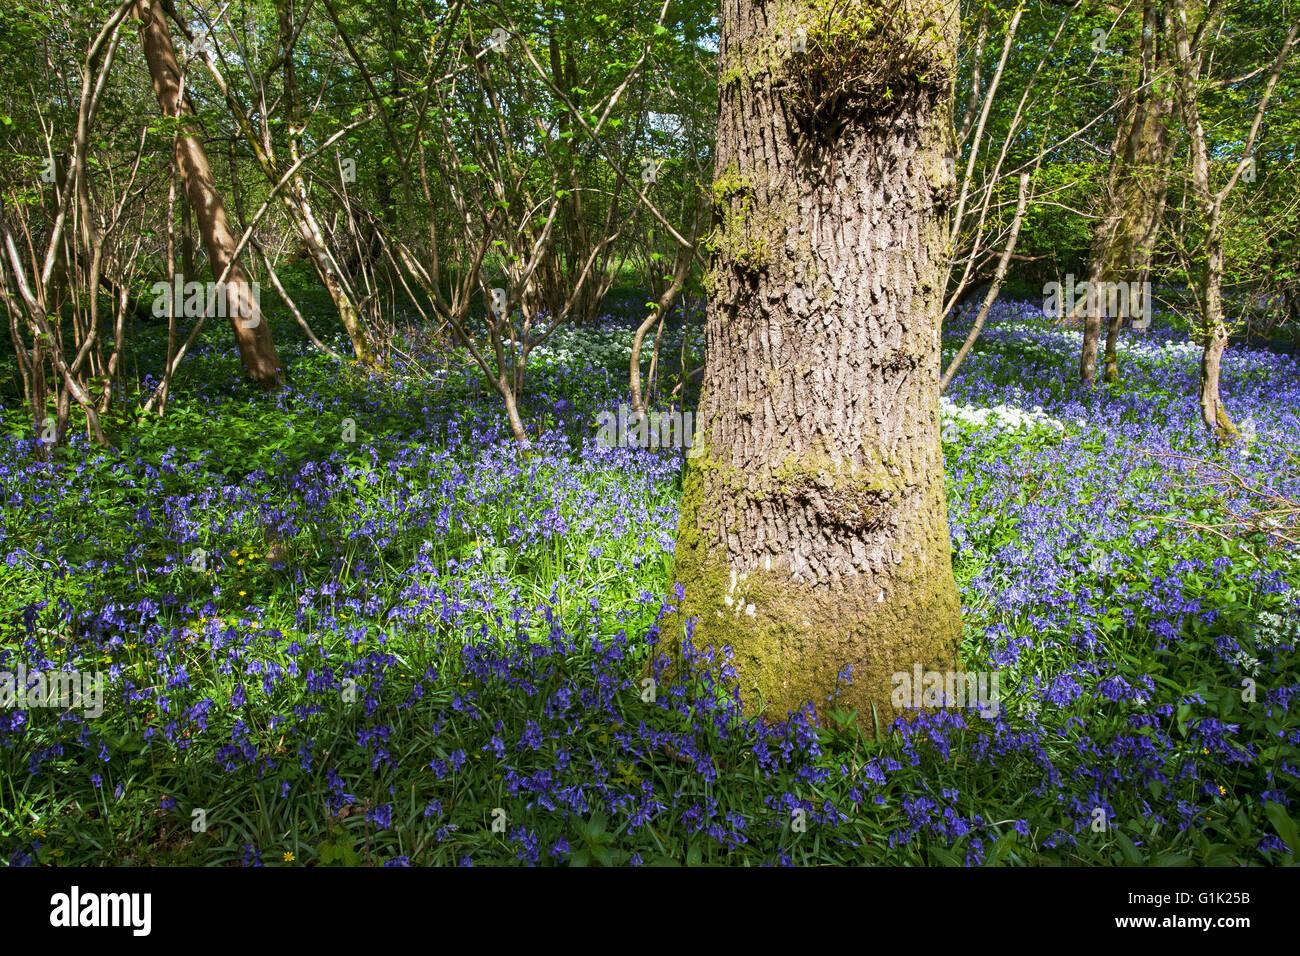 Bluebell Hyacinthoides non-scripta Garston Wood RSPB reserve near Shaftesbury Dorset England UK - Stock Image